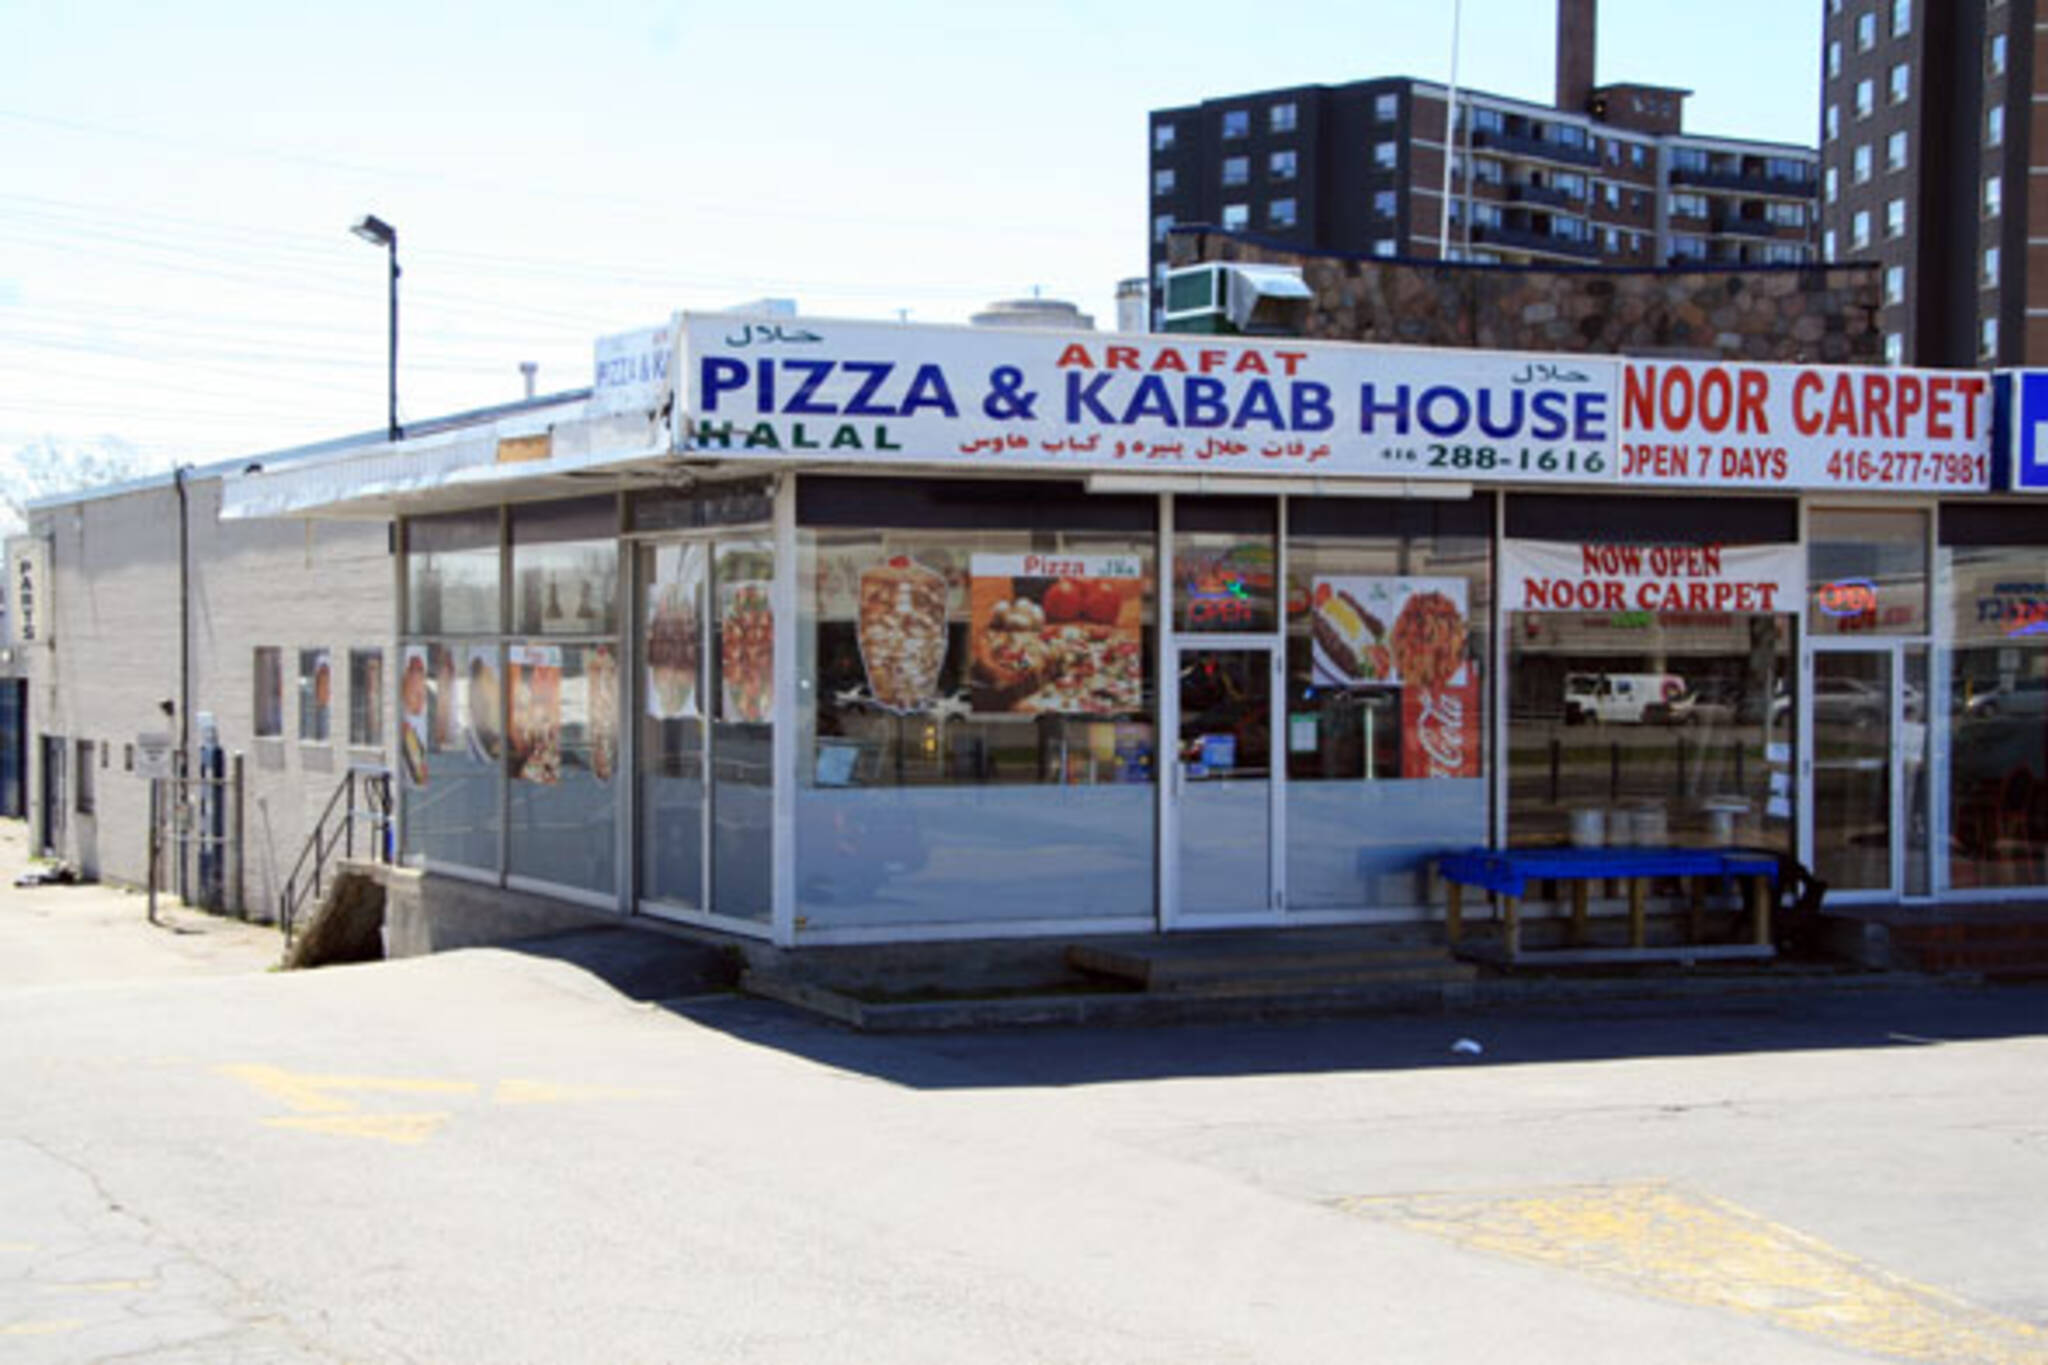 Arafat Halal Pizza & Kabab House